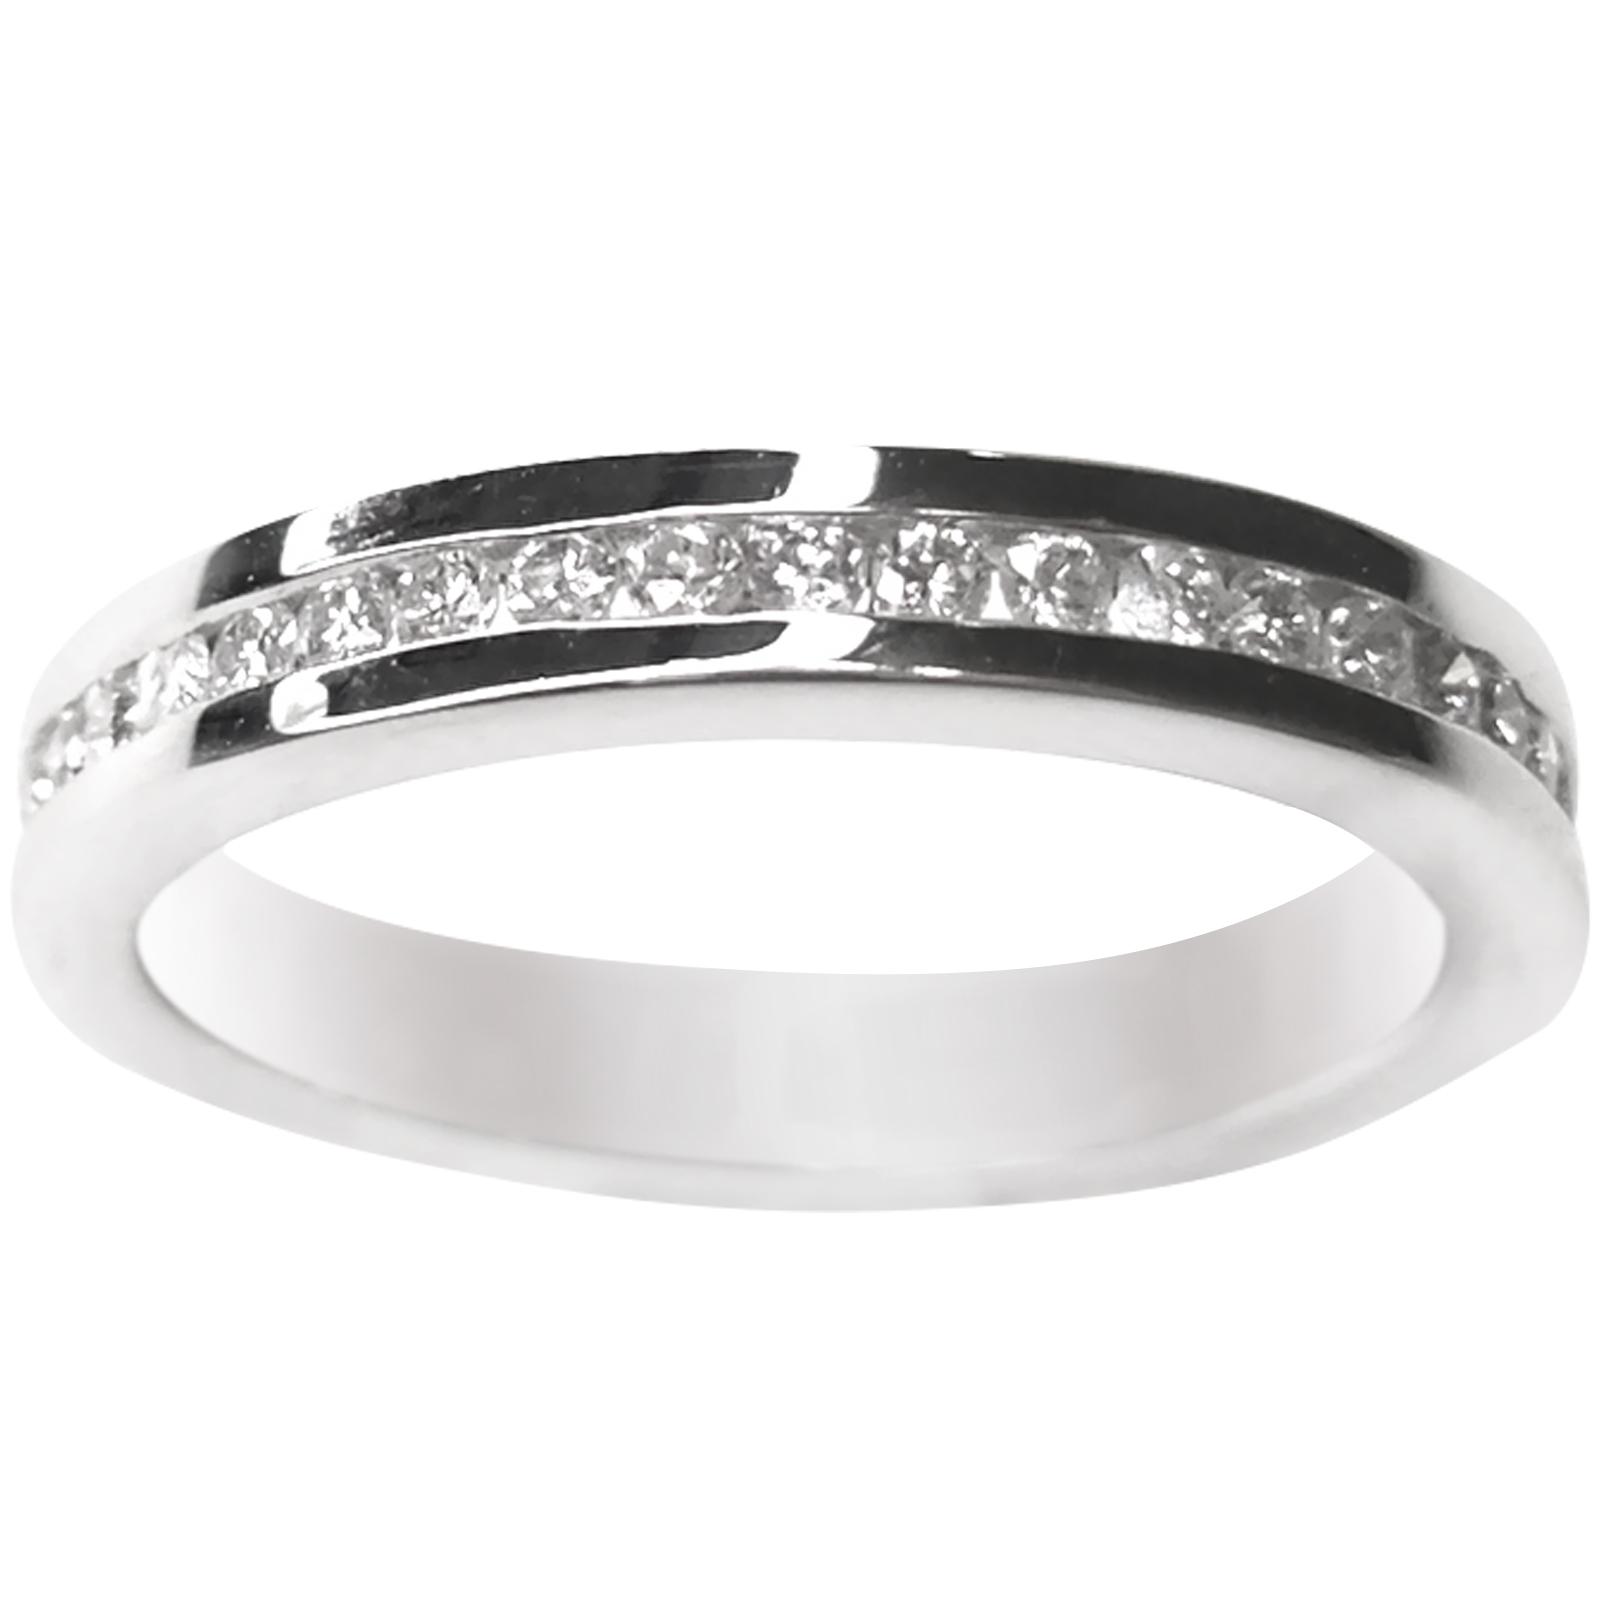 CHANNEL SET DIAMOND ETERNITY RING BESPOKE FINE JEWELLERY BY SHAHINA HATTA